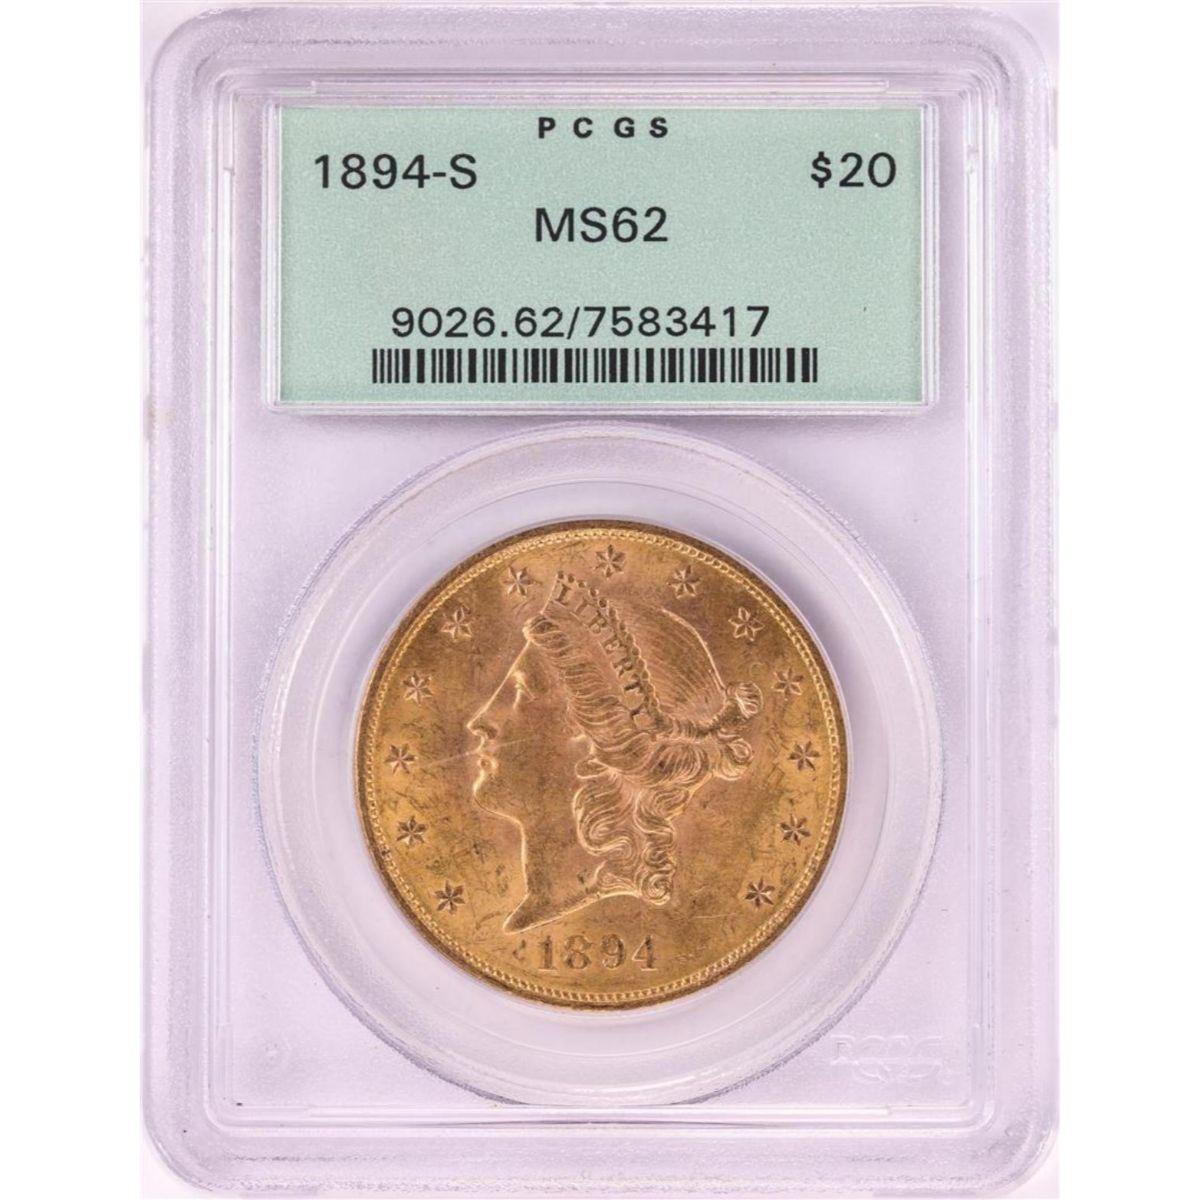 BK Auctions – Silver & Gold Coins + Paper Money Event!